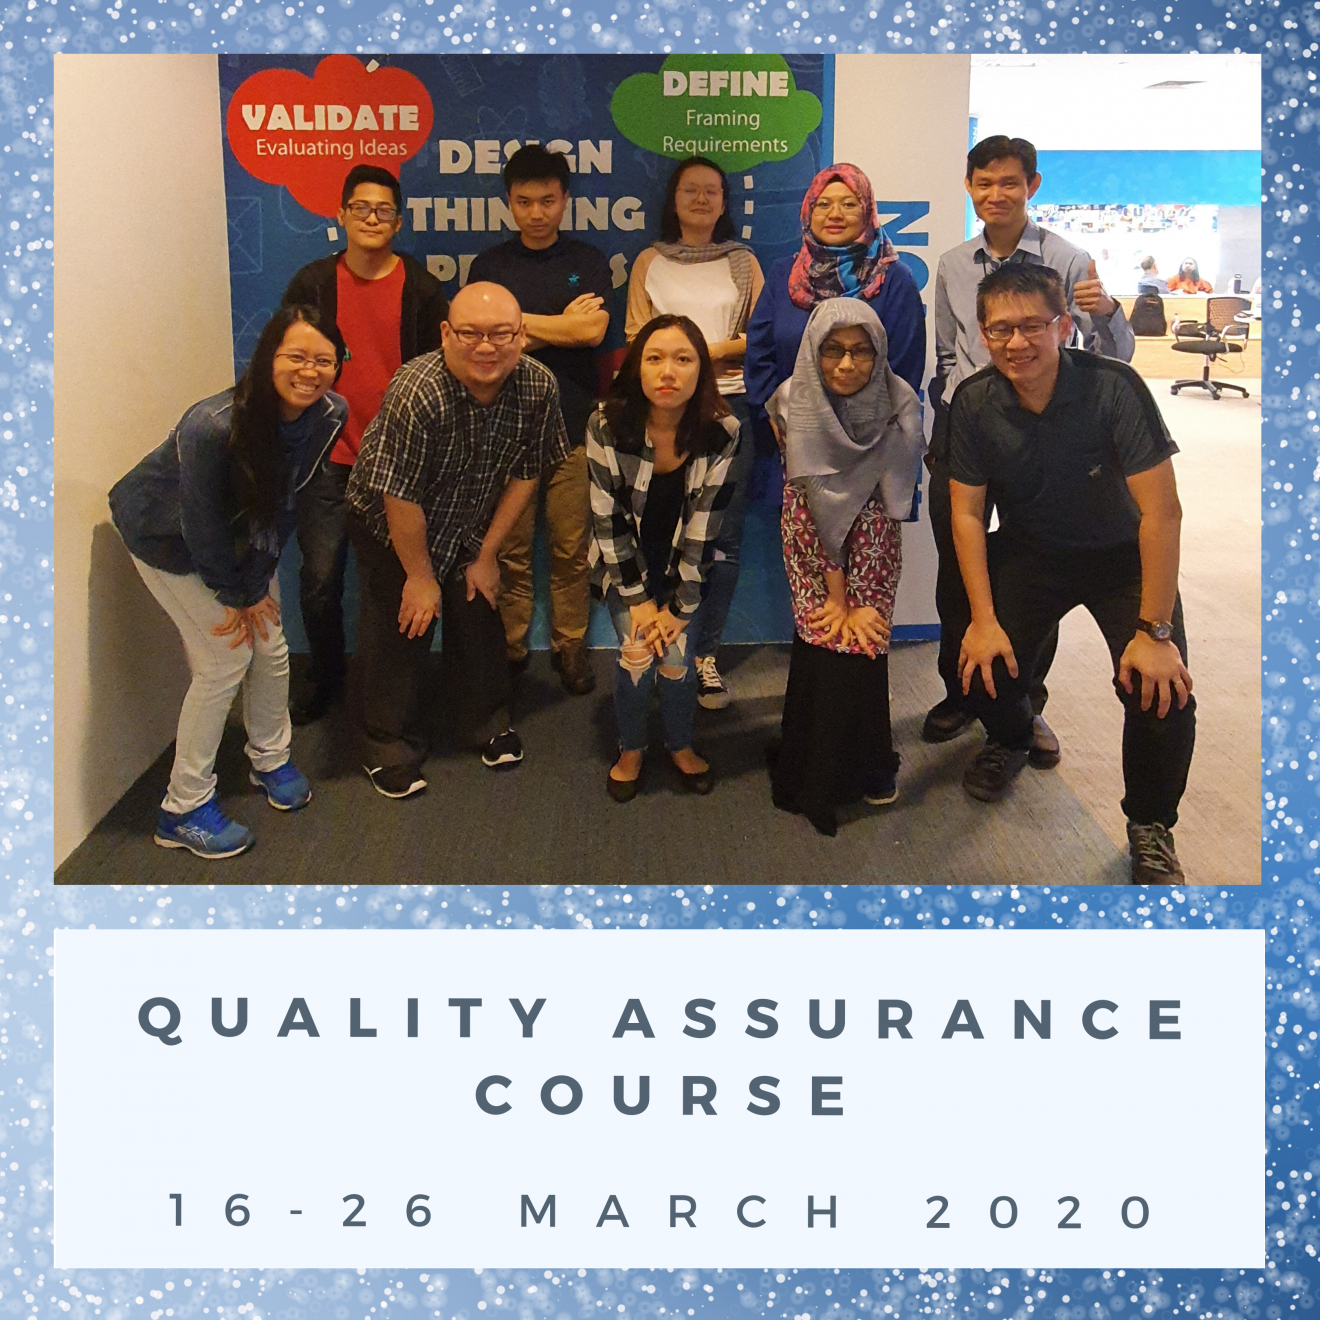 Quality Assurance Course